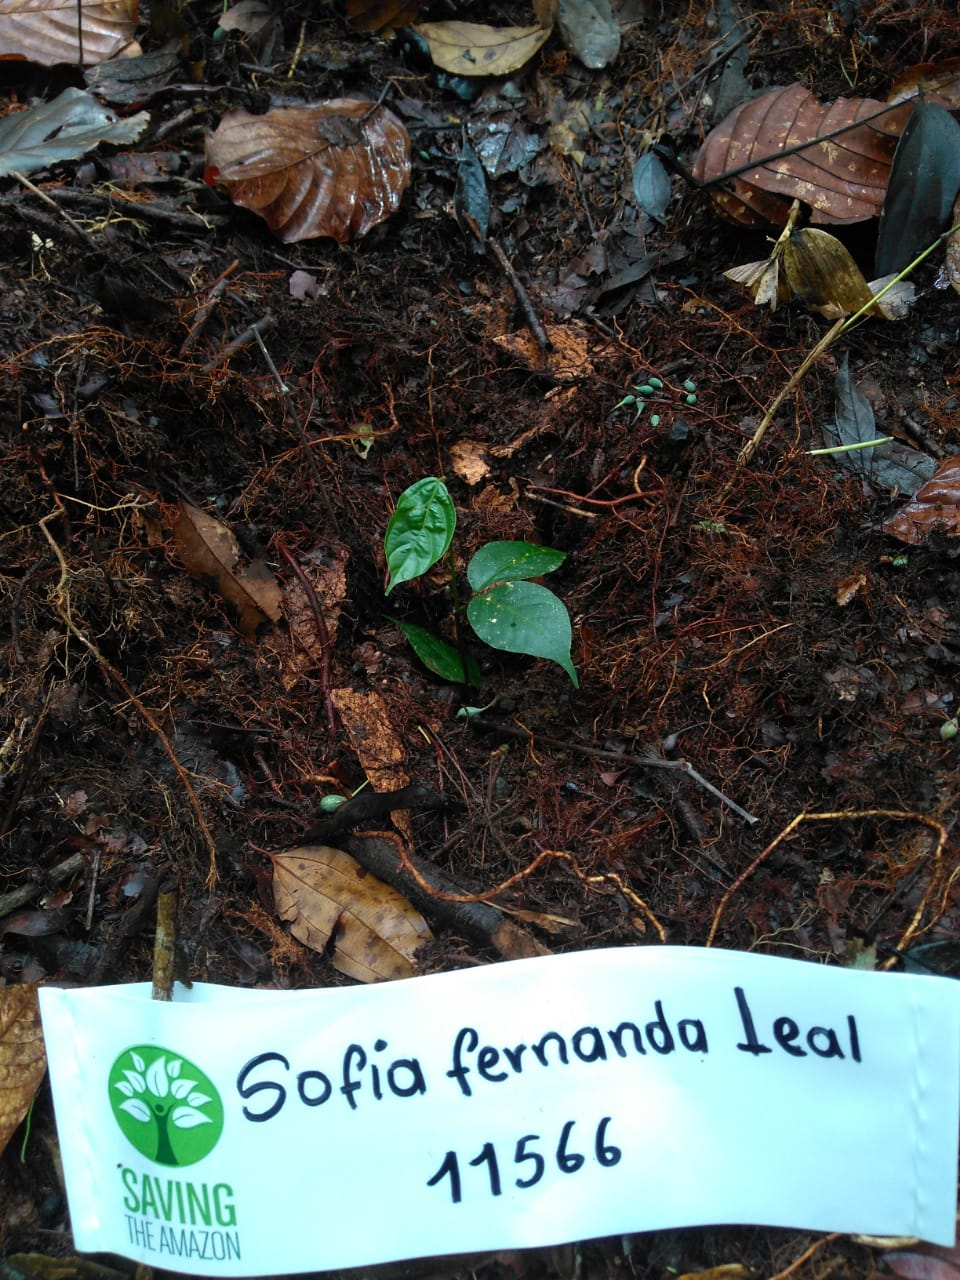 Sofia Fernanda Leal